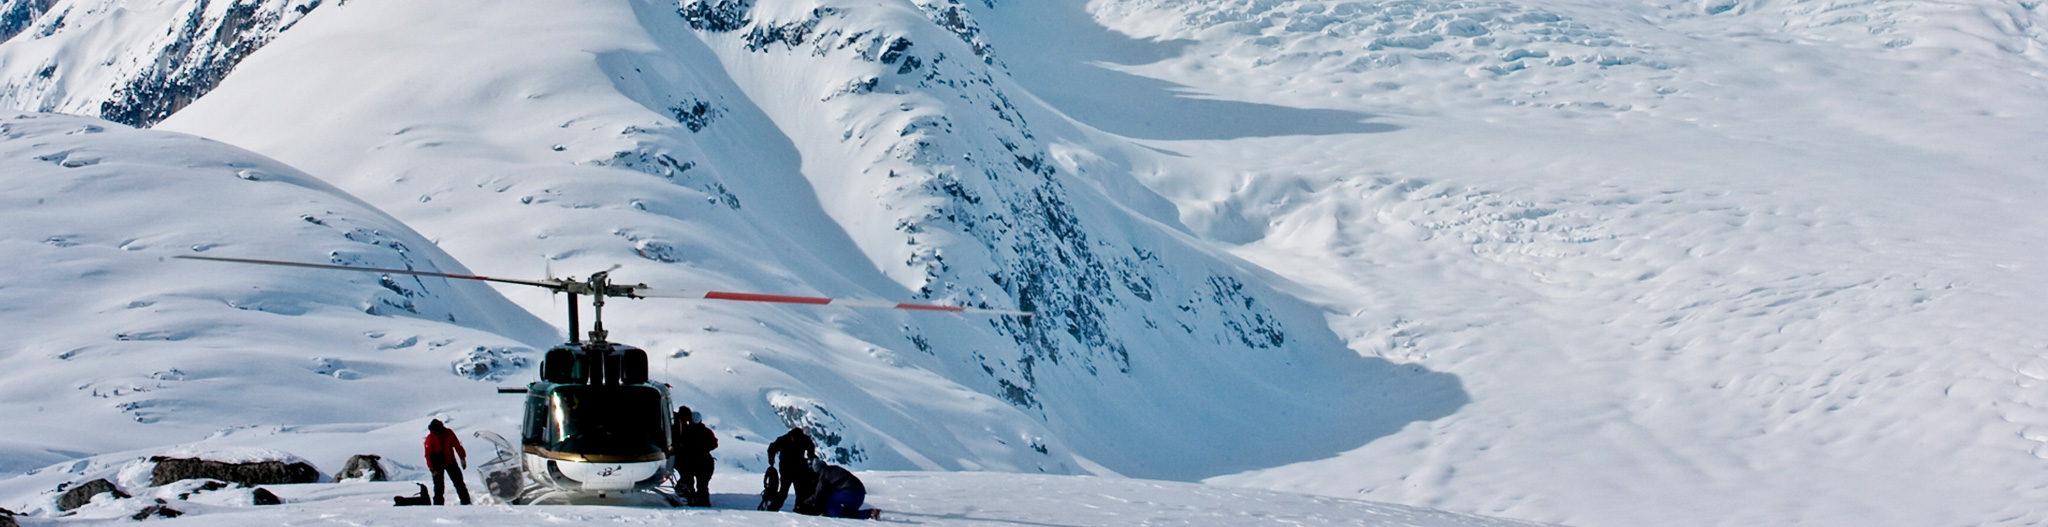 Skyline Helicopters heli skiing holidays Yellow Cedar Lodge Kelowna Terrace BC